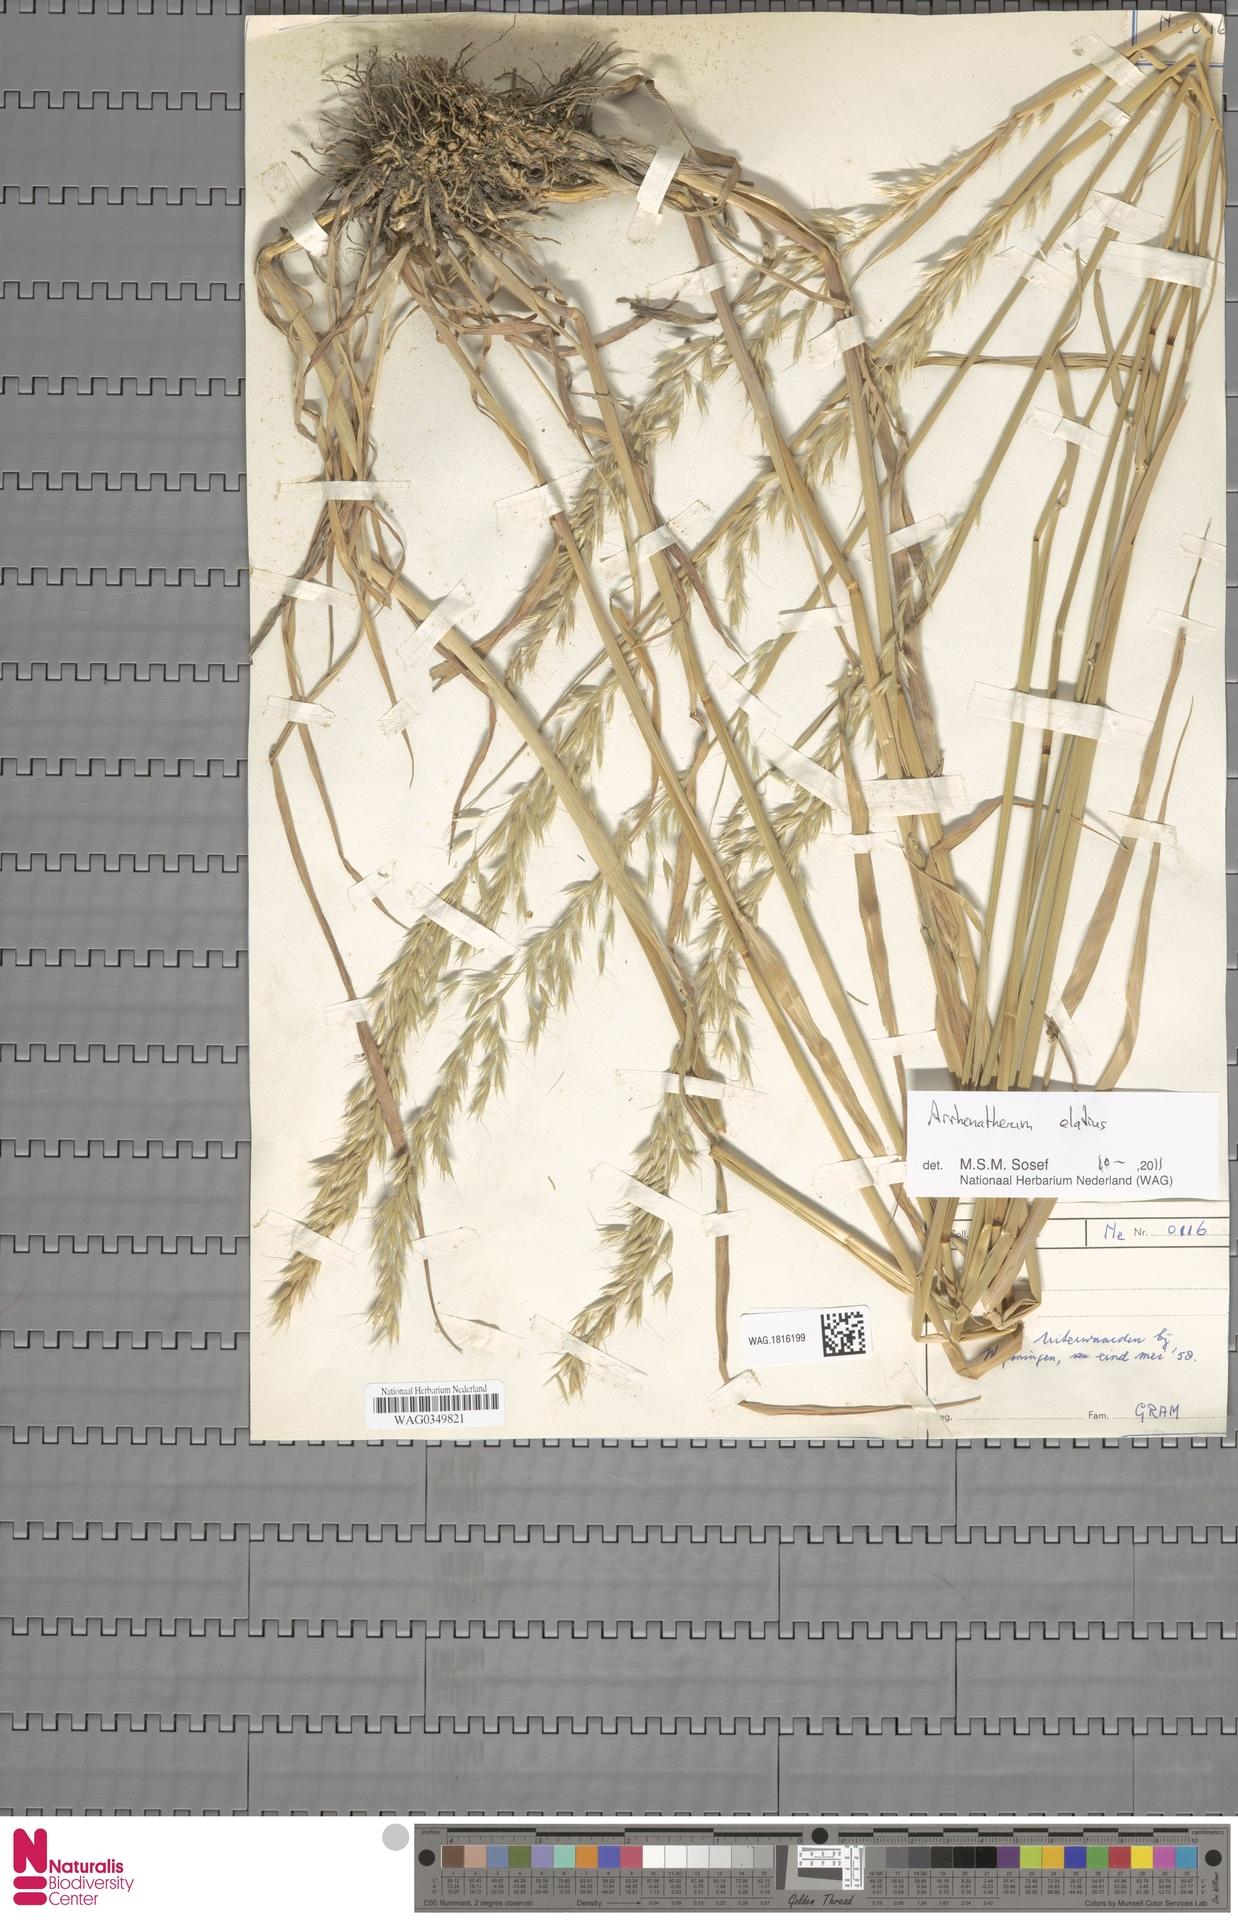 WAG.1816199   Arrhenatherum elatius (L.) P.Beauv. ex J.Presl & C.Presl